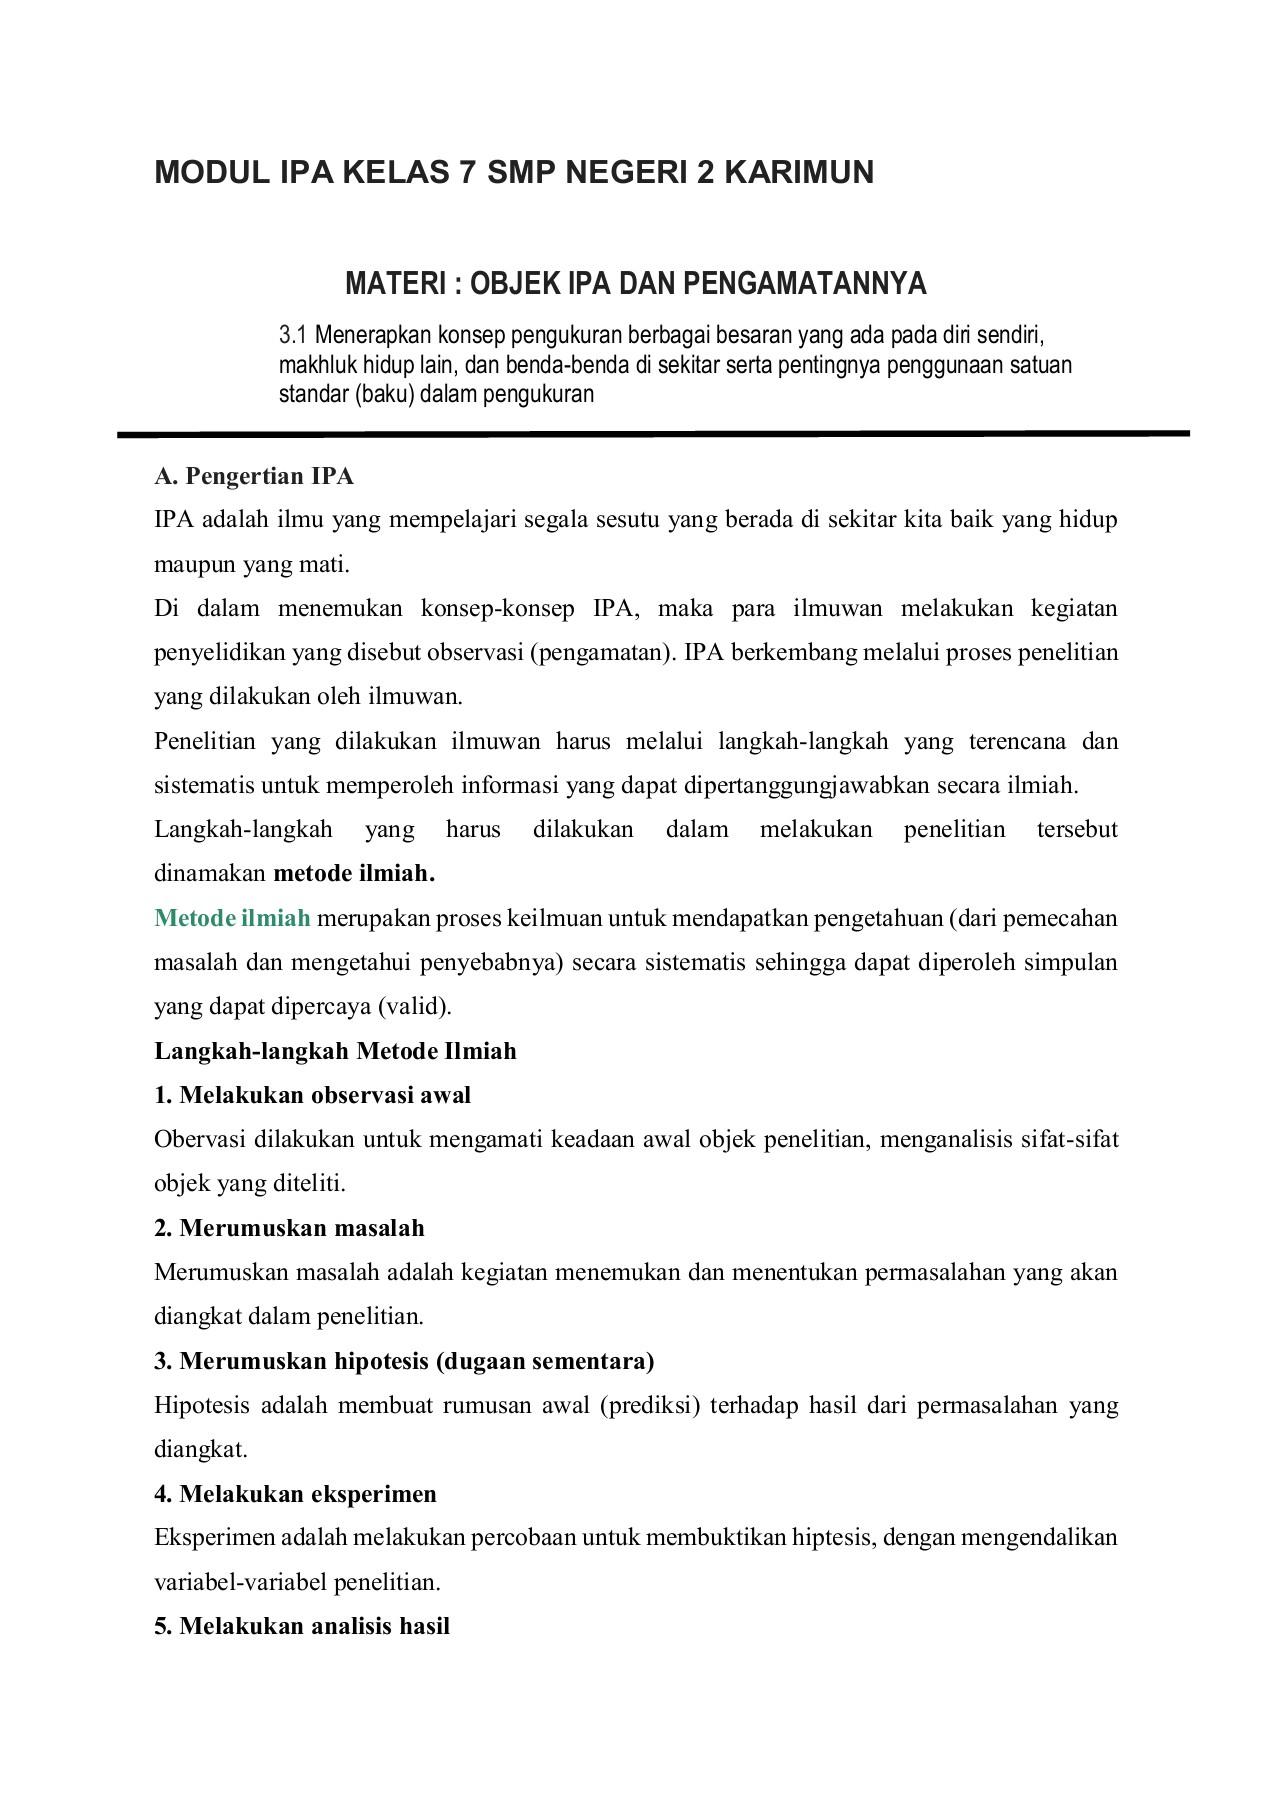 Penyelidikan Ipa Kelas 7 : penyelidikan, kelas, MODUL, KELAS, NEGERI, KARIMUN, Pages, Download, FlipHTML5